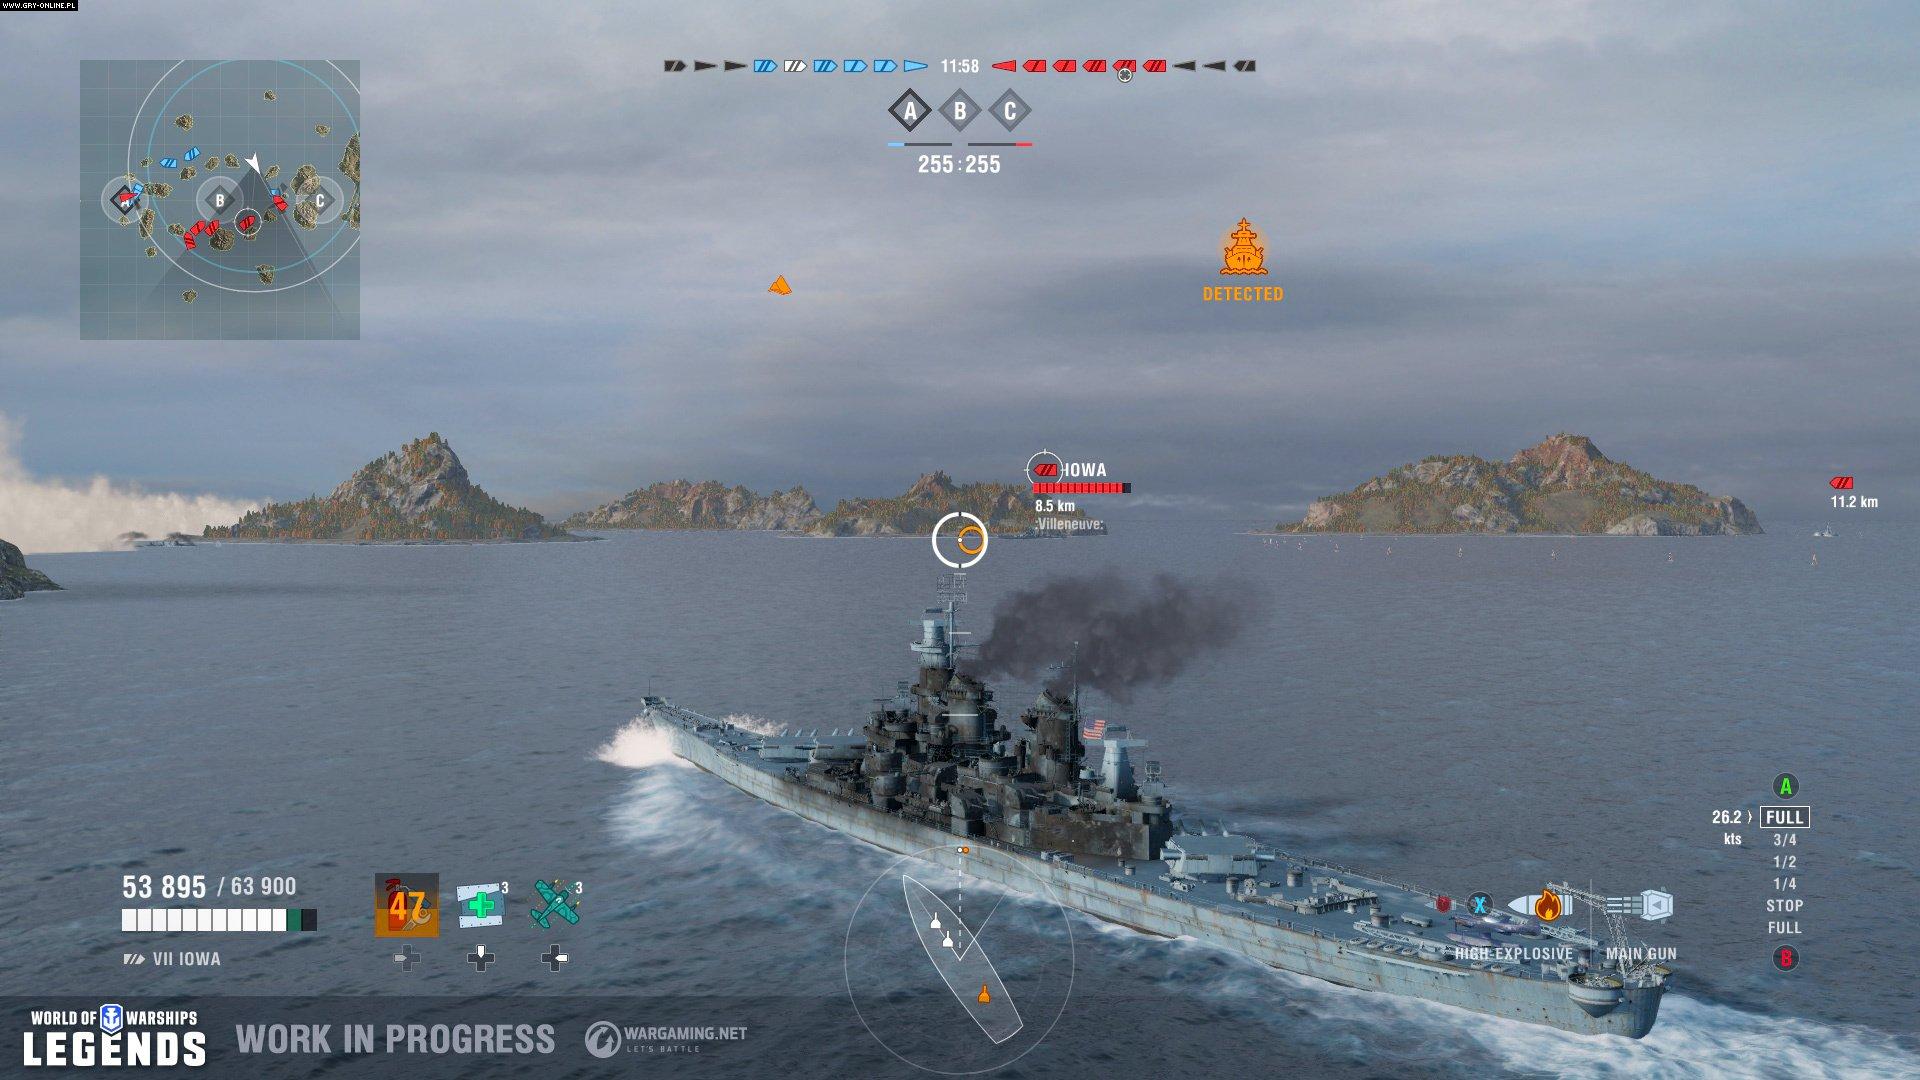 World of Warships: Legends - screenshots gallery